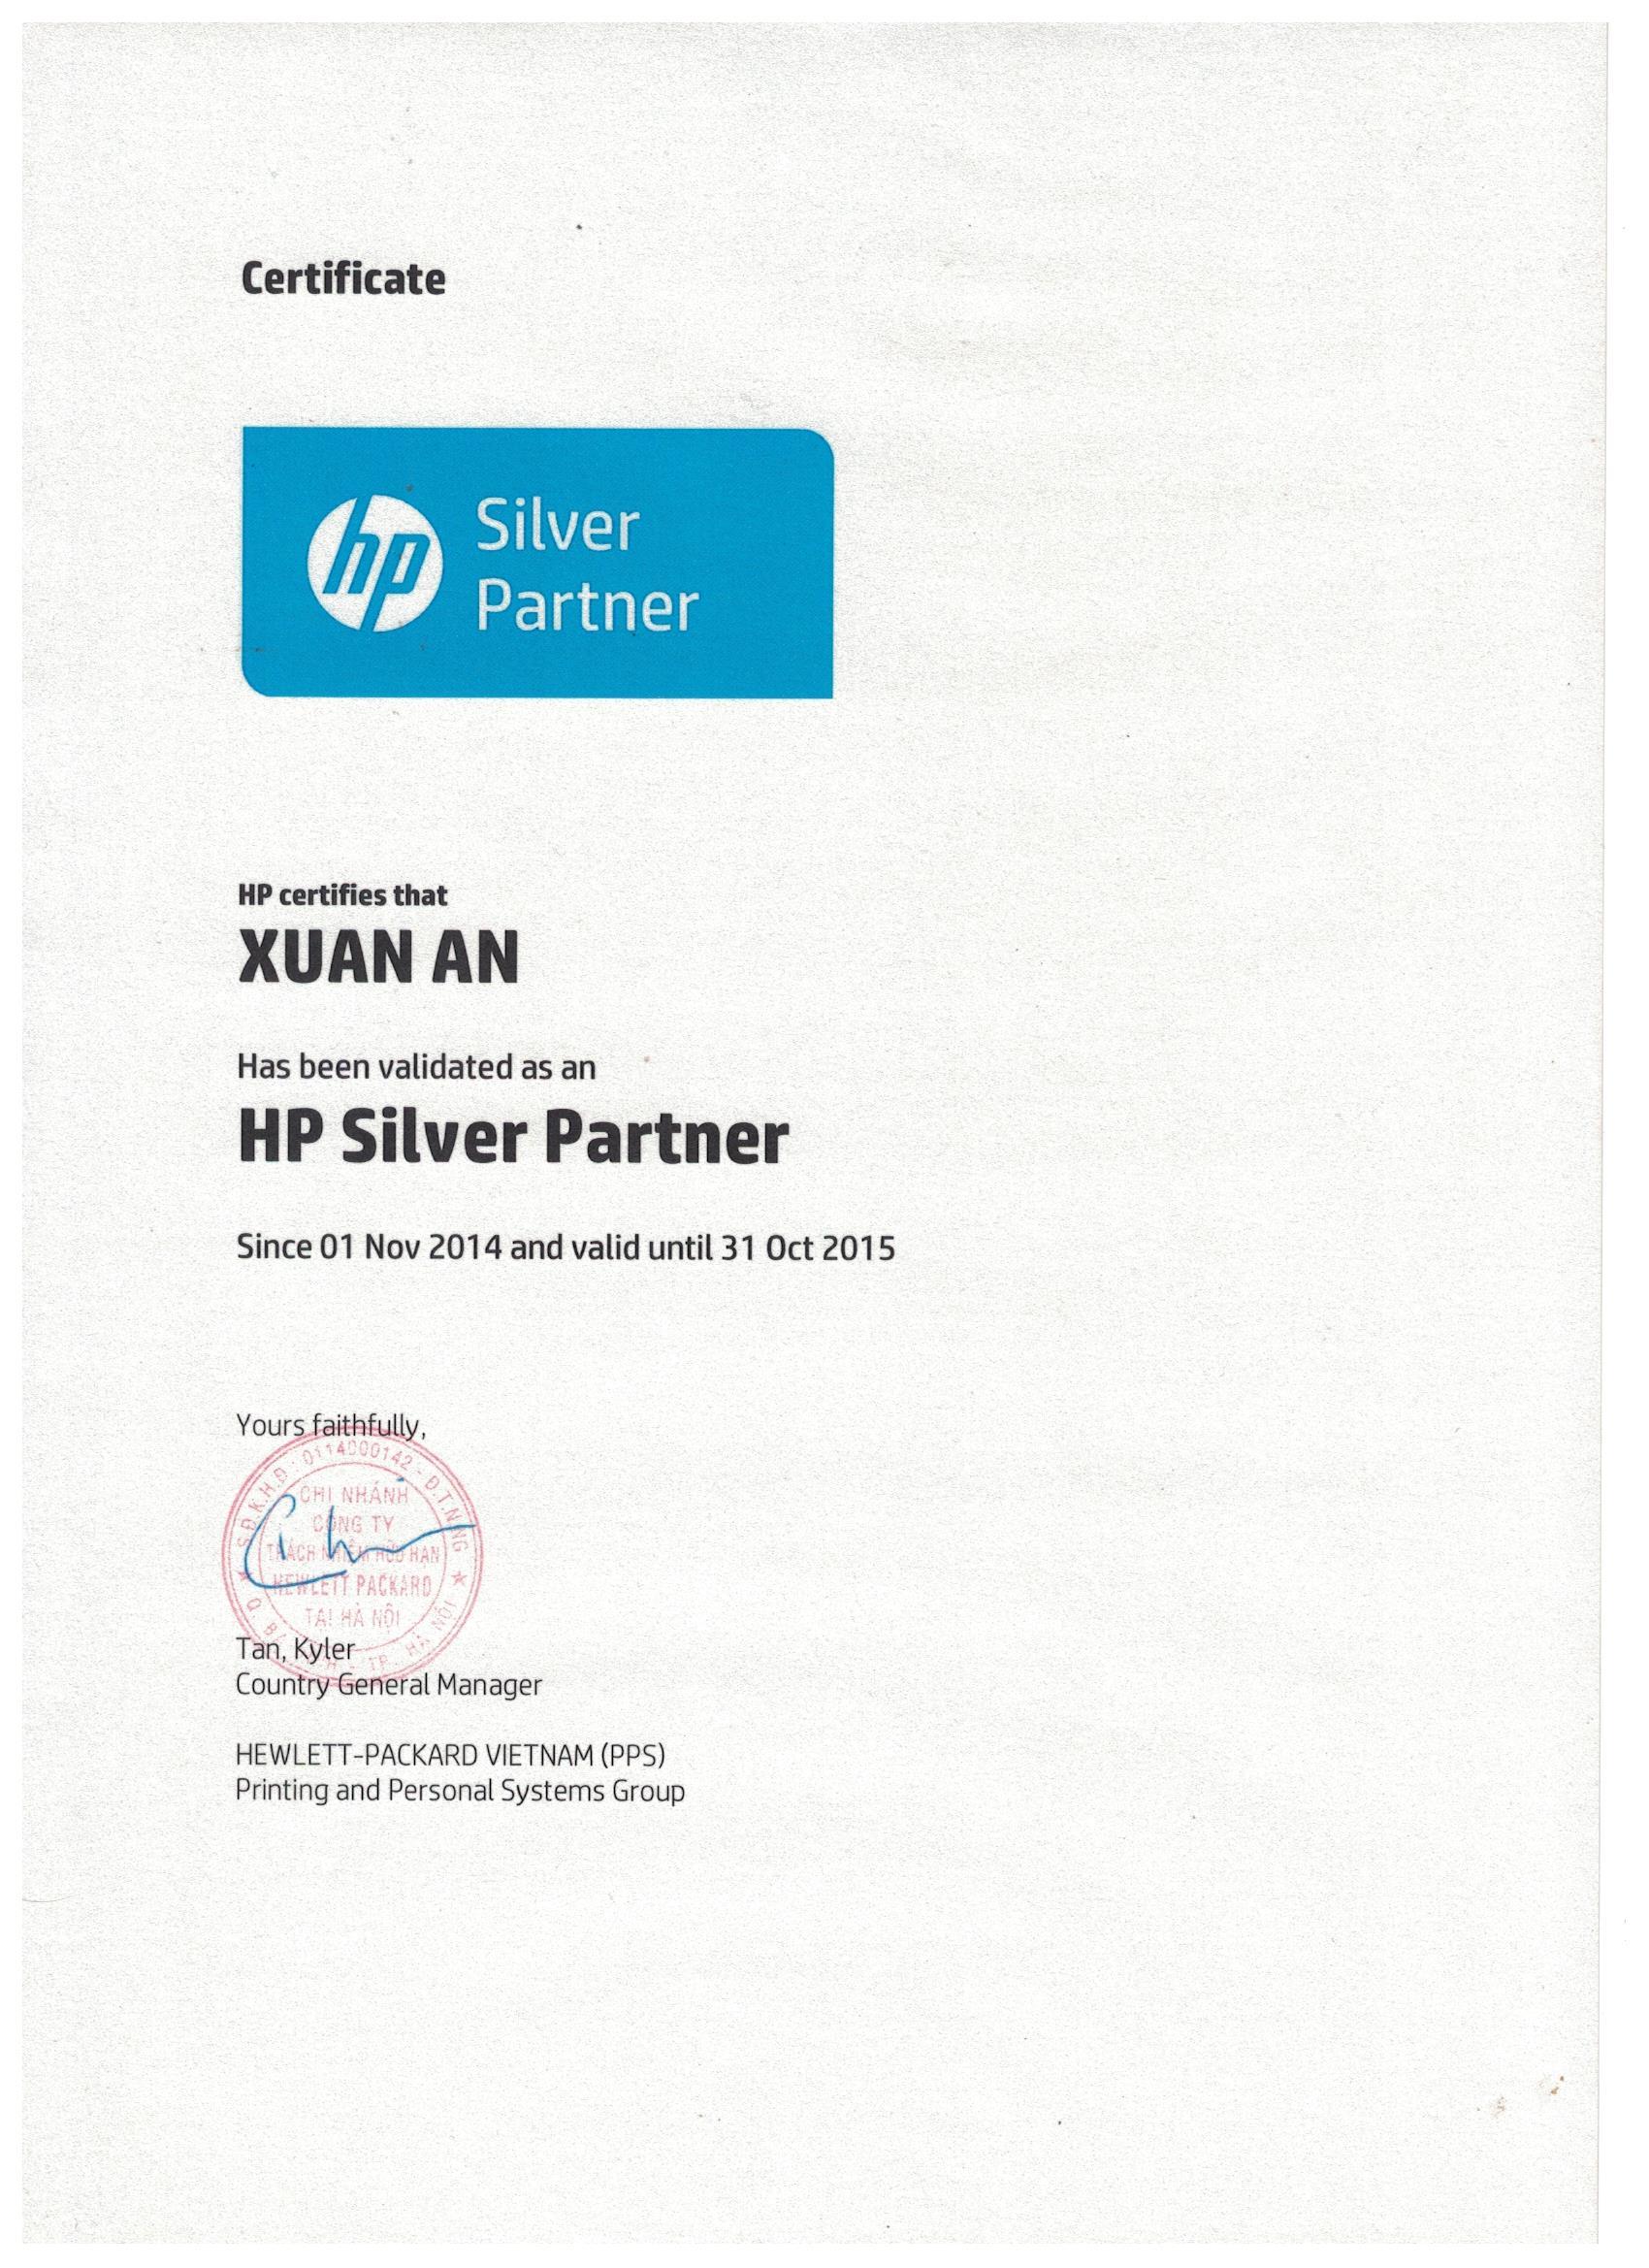 HP Probook 430 G7 - 9GQ10PA (Silver)